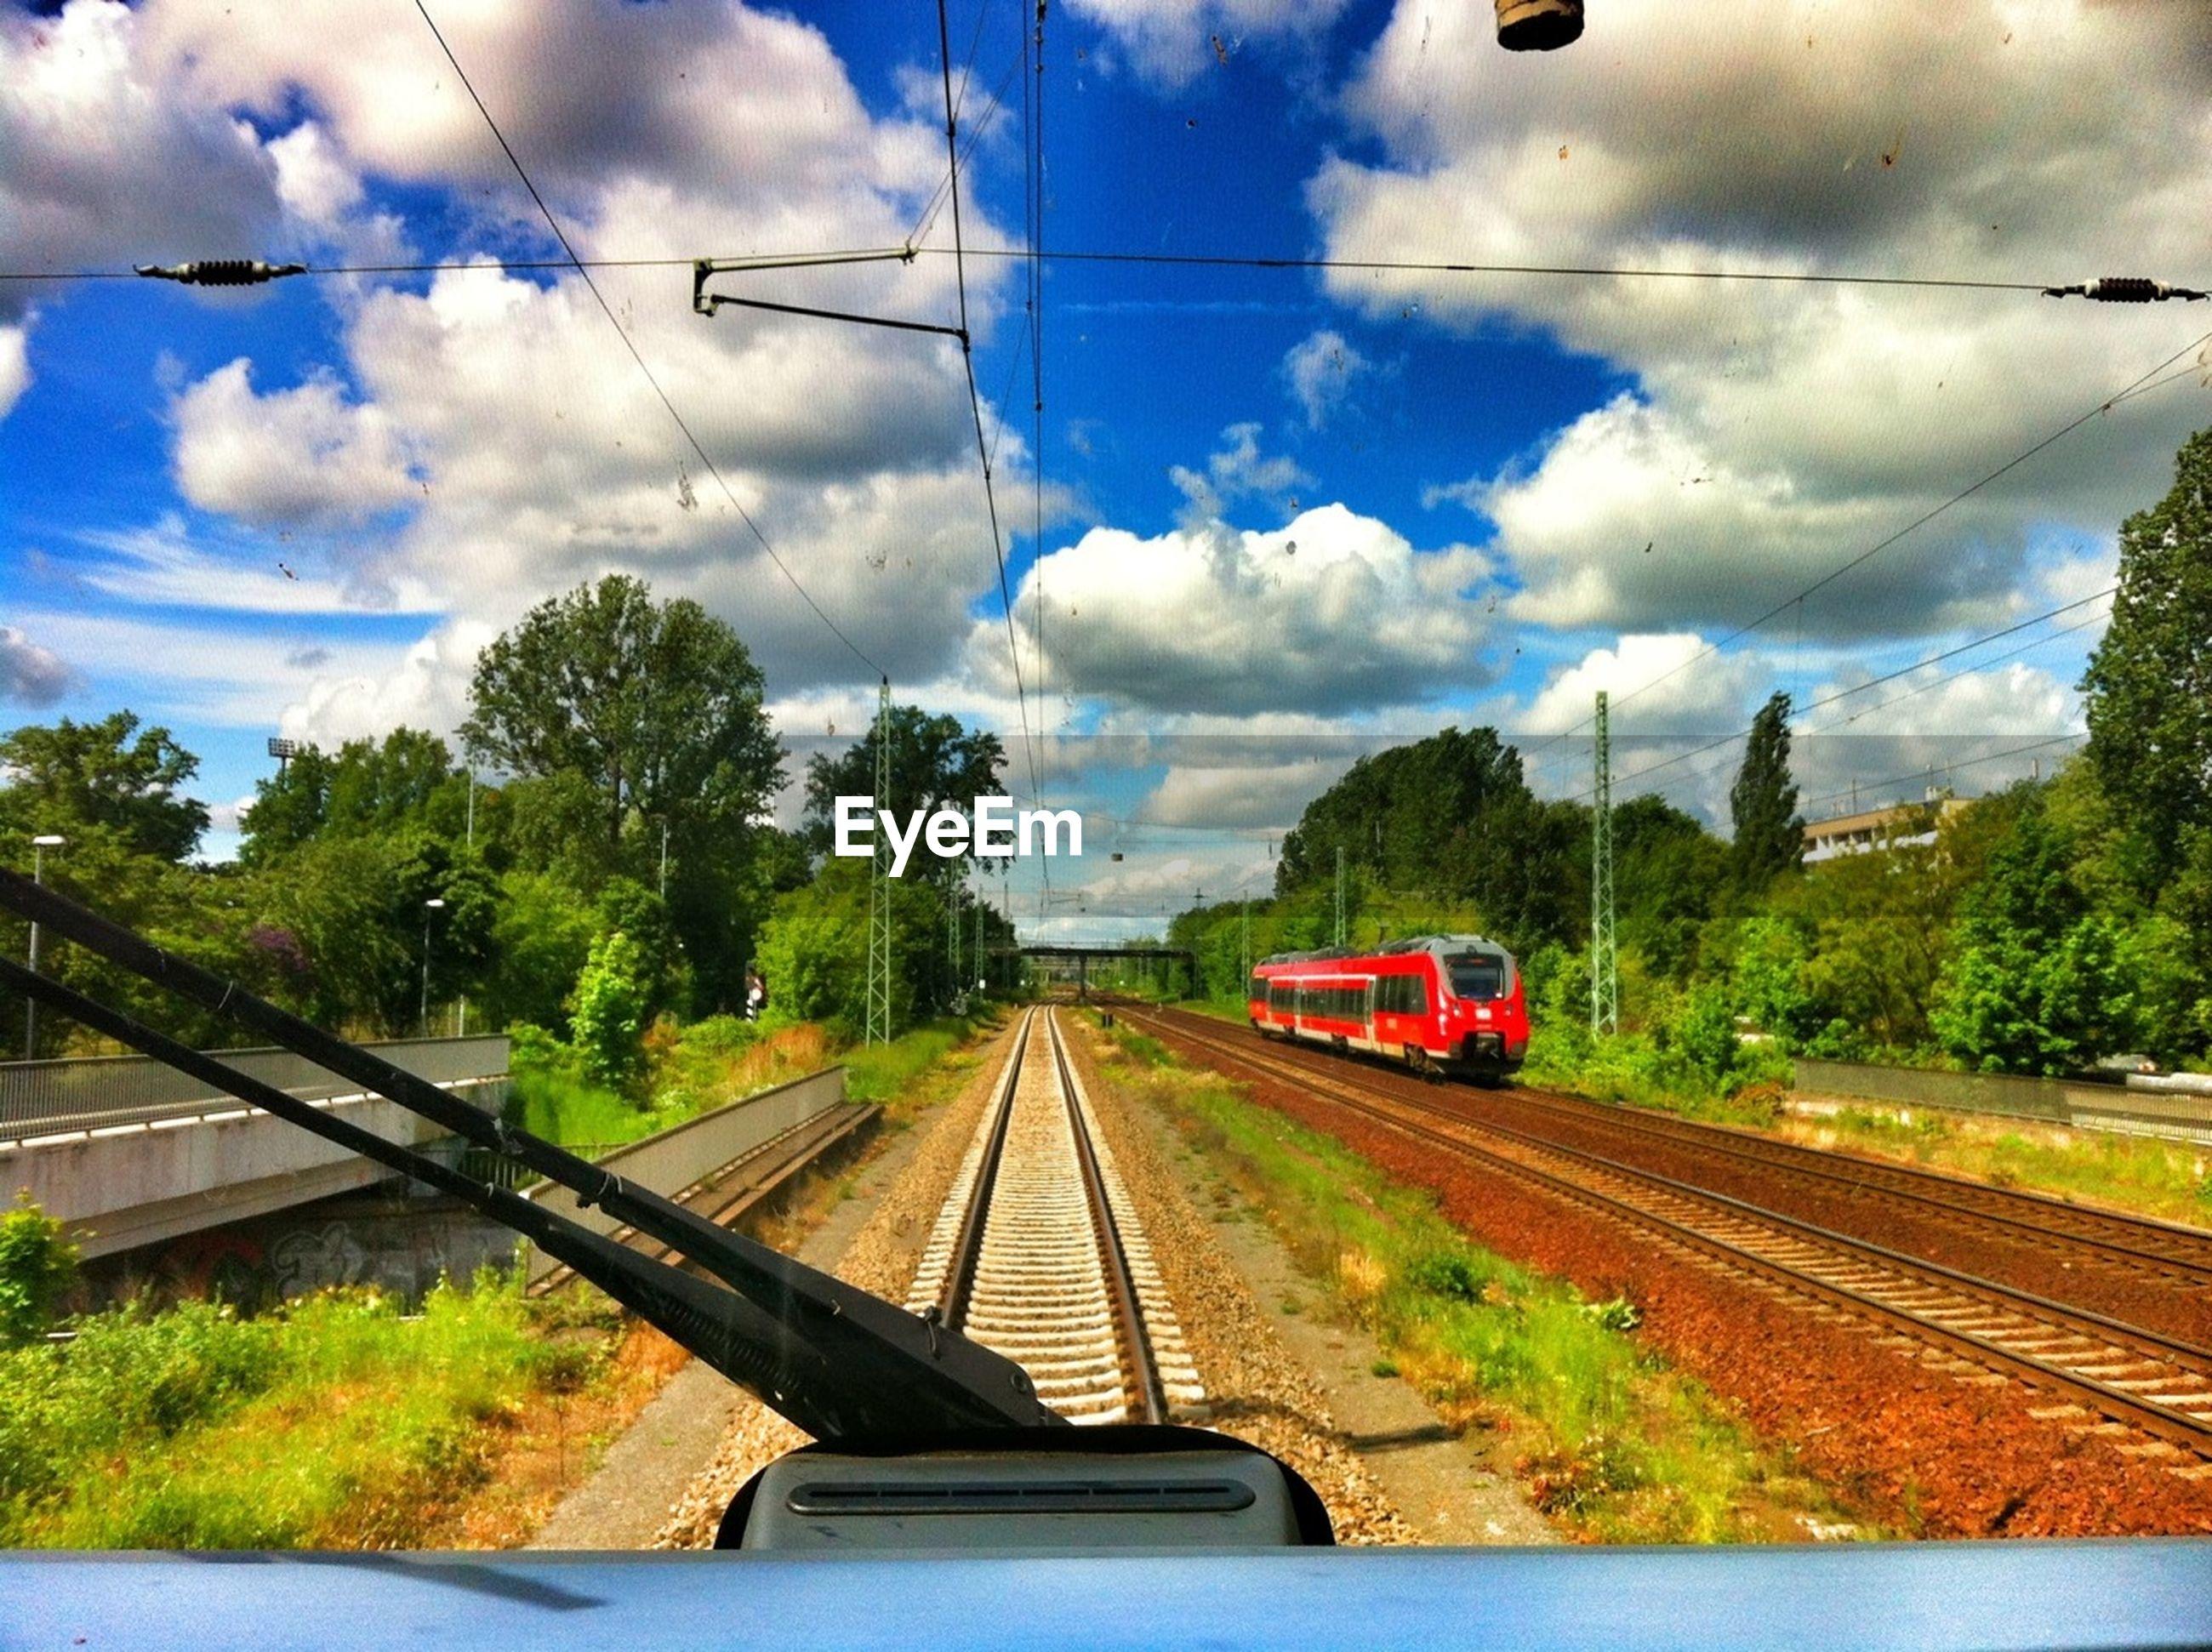 Railroad tracks seen through train windshield